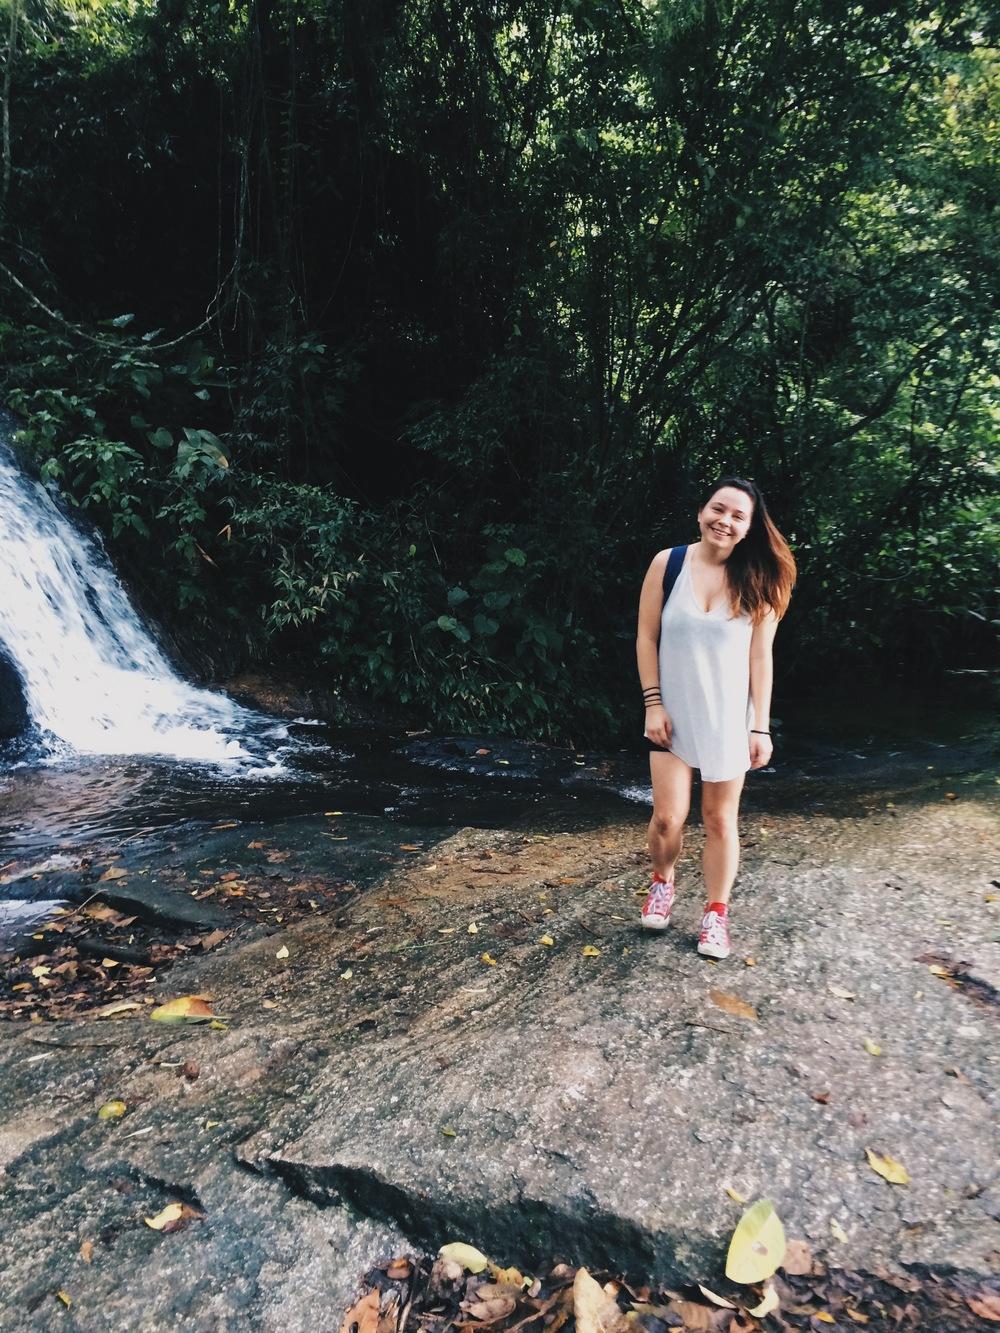 Ilhabela, Brazil